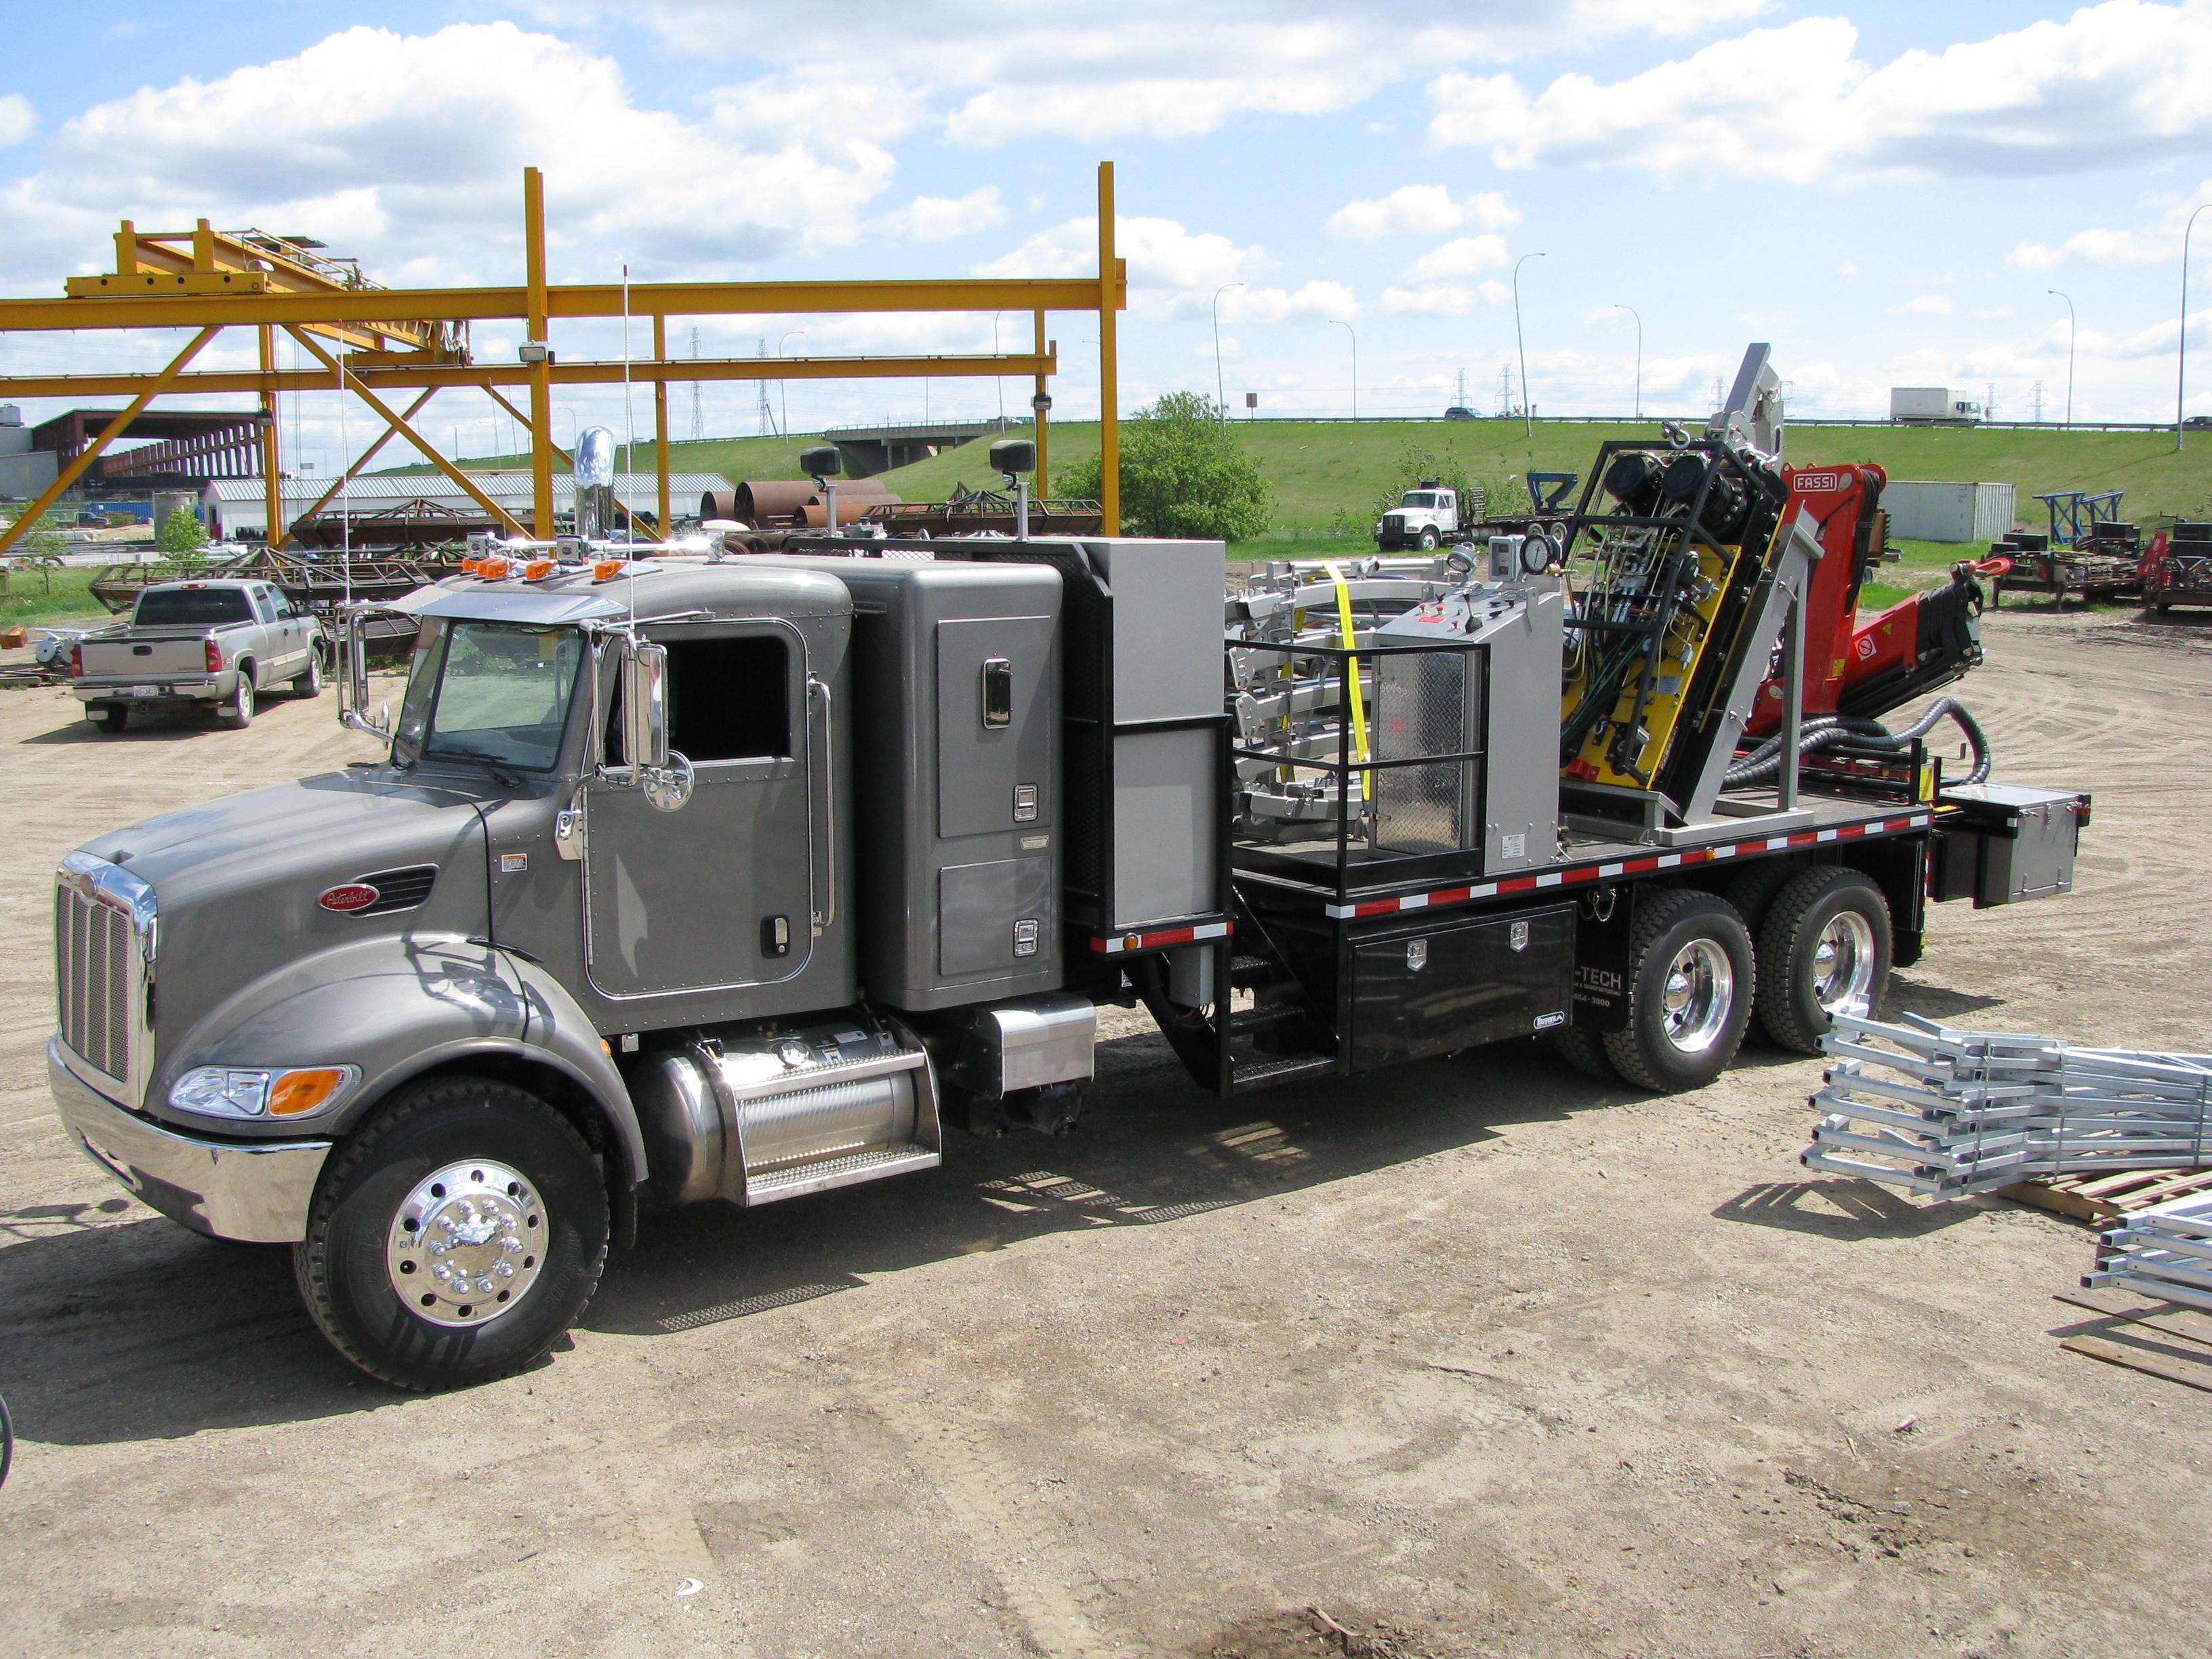 TMX Unit (Truck Mounted X-celerator)